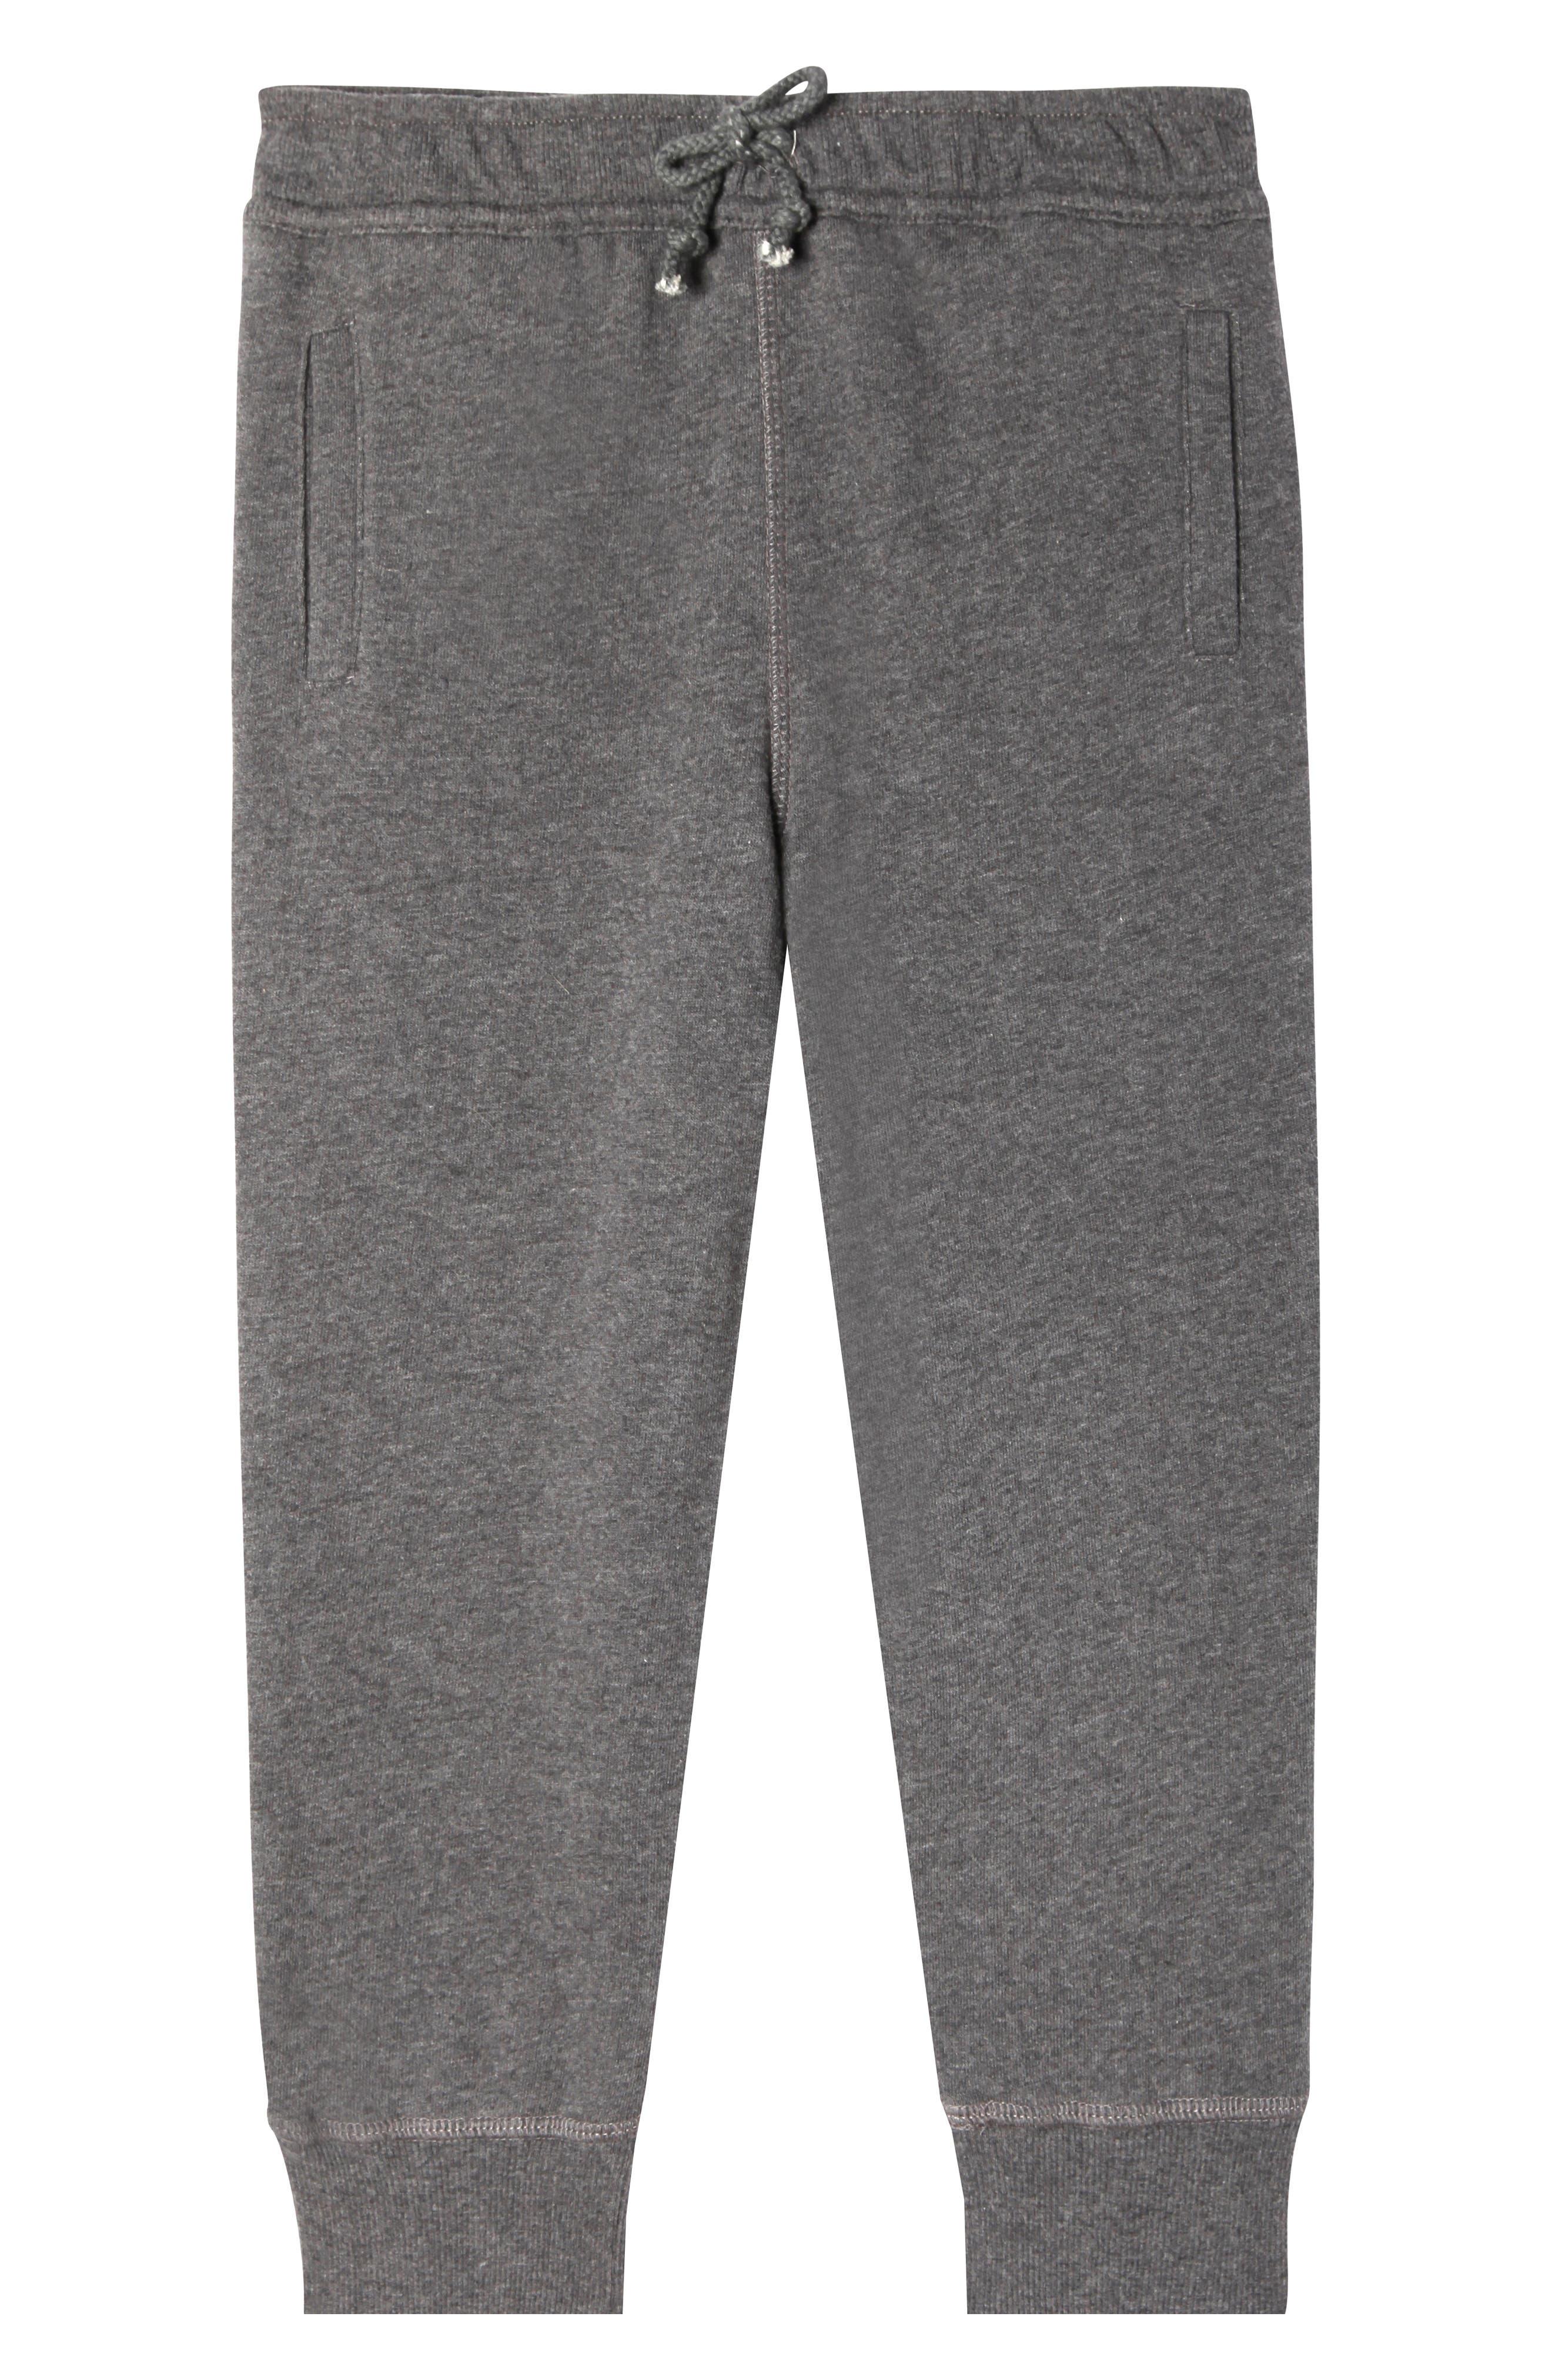 Mercer Jogger Pants,                         Main,                         color, 020